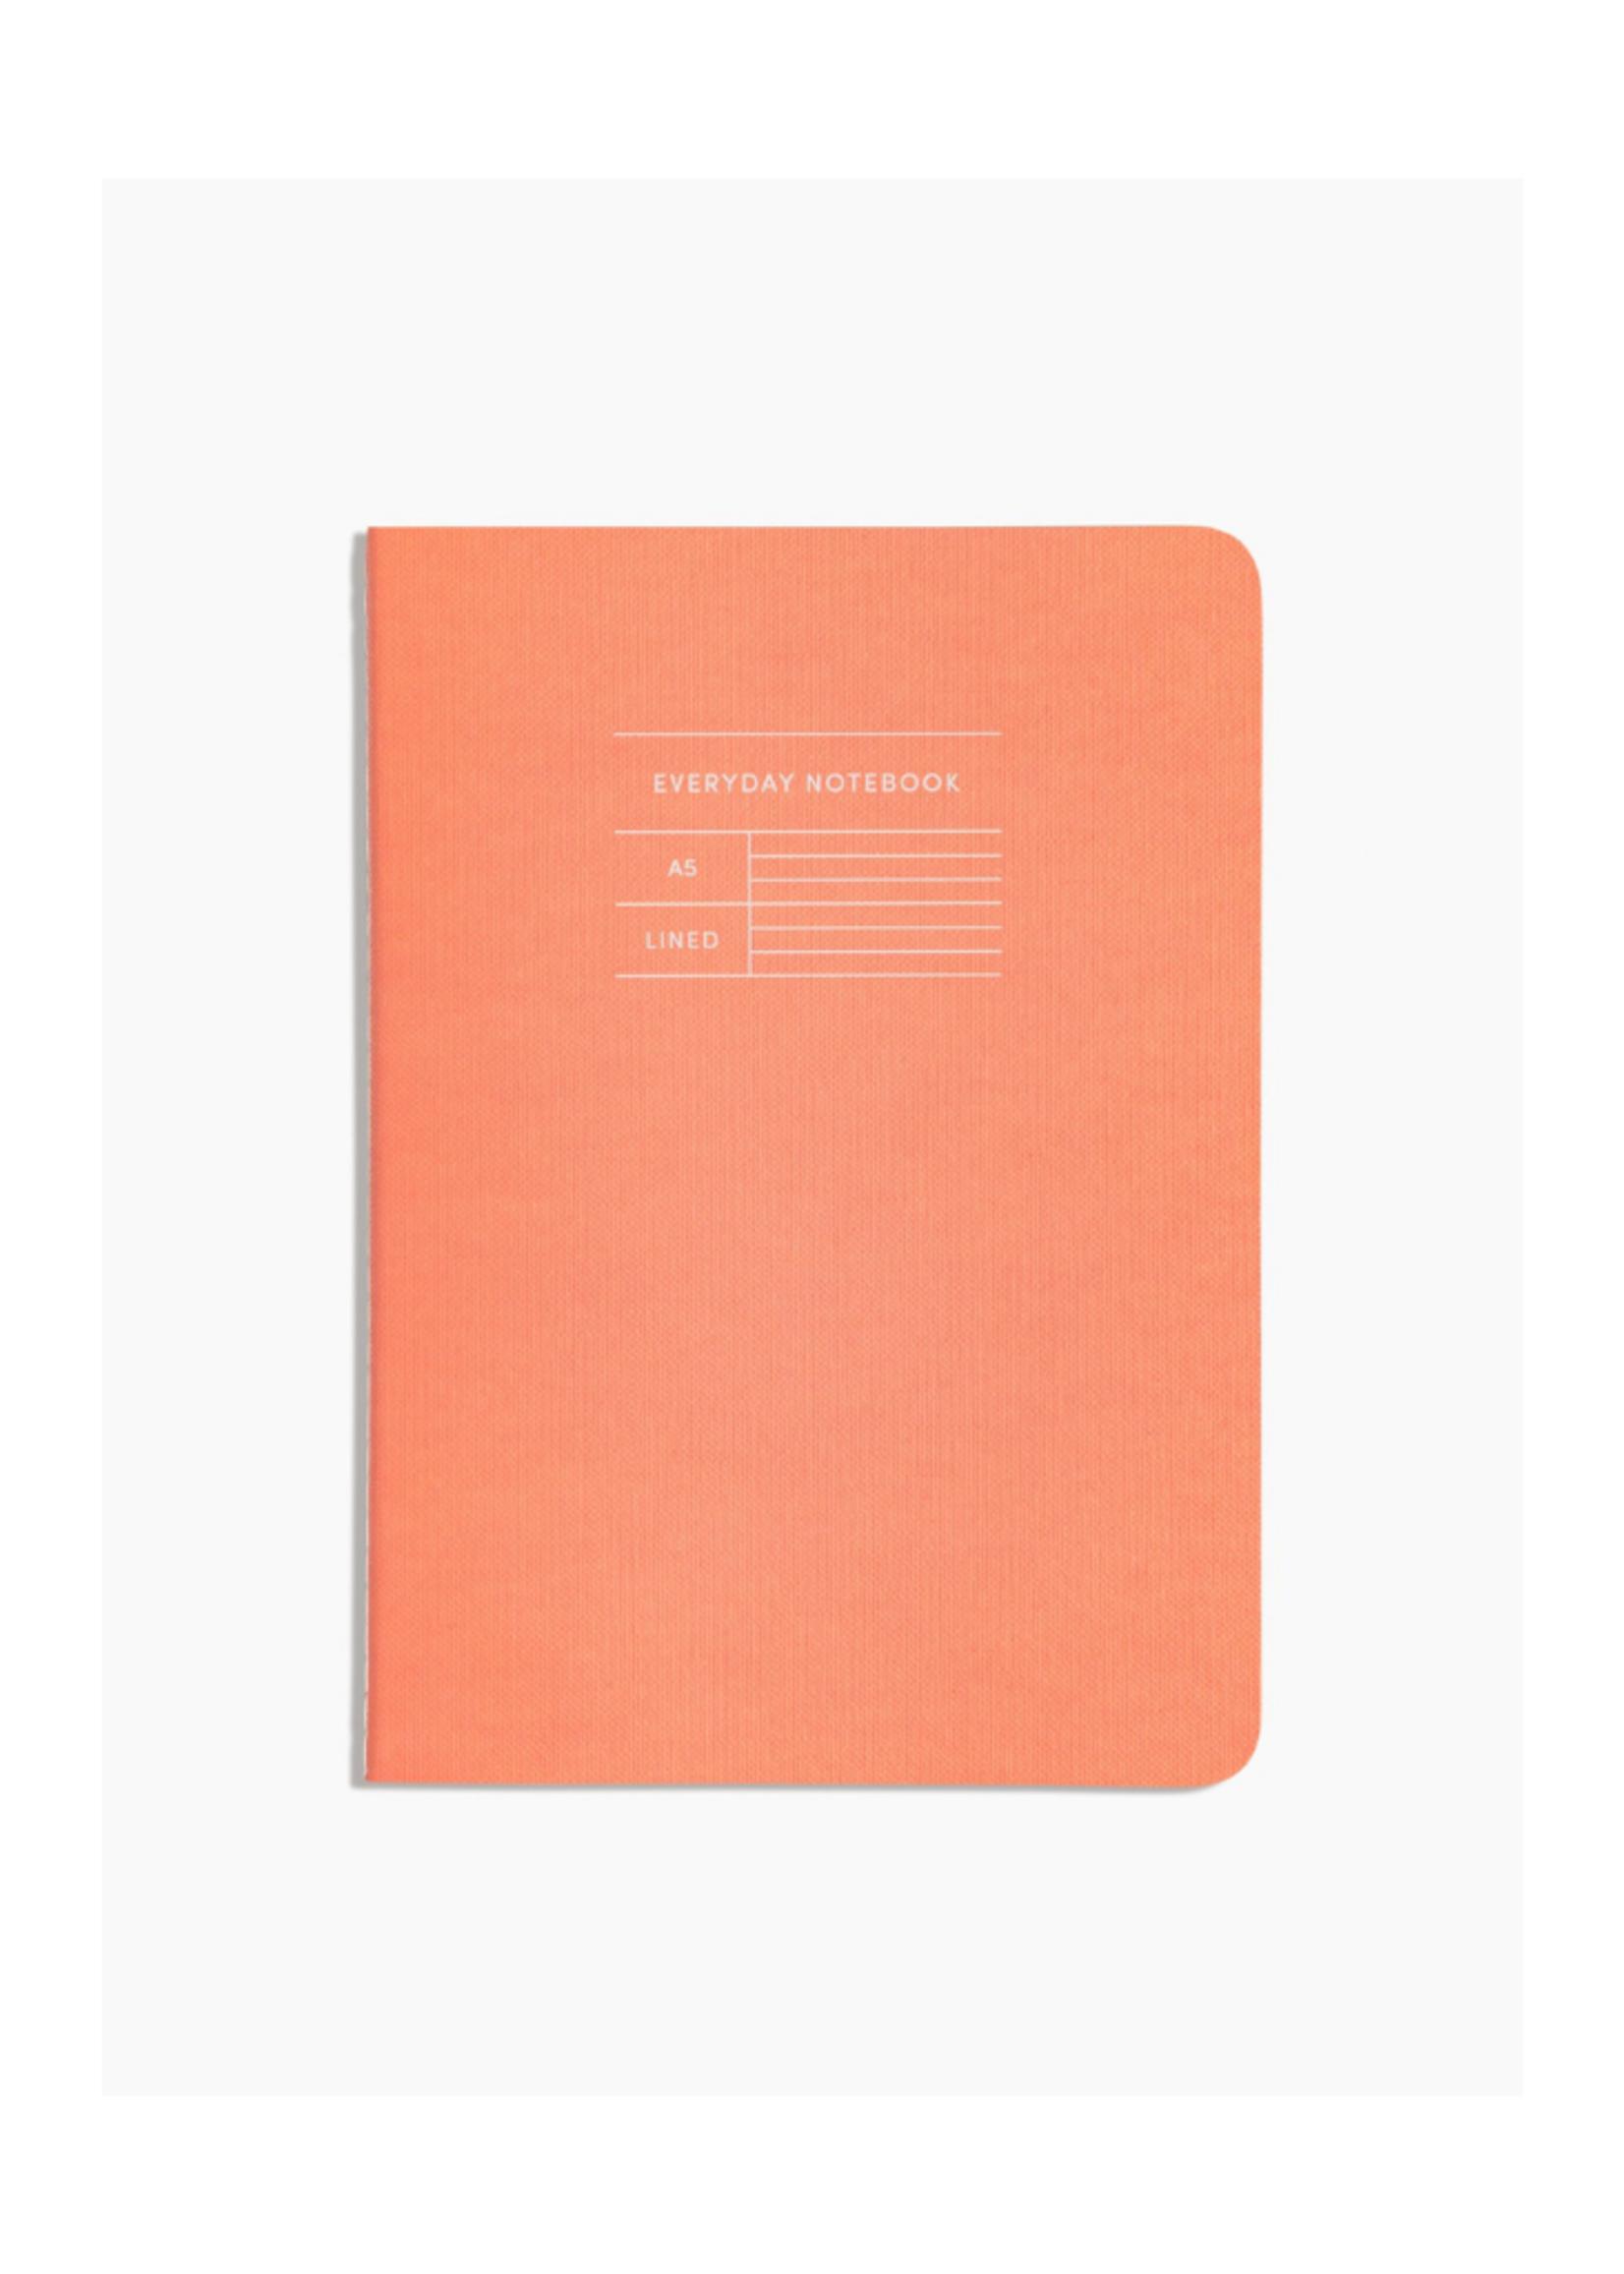 Poketo Everyday Notebook Lined